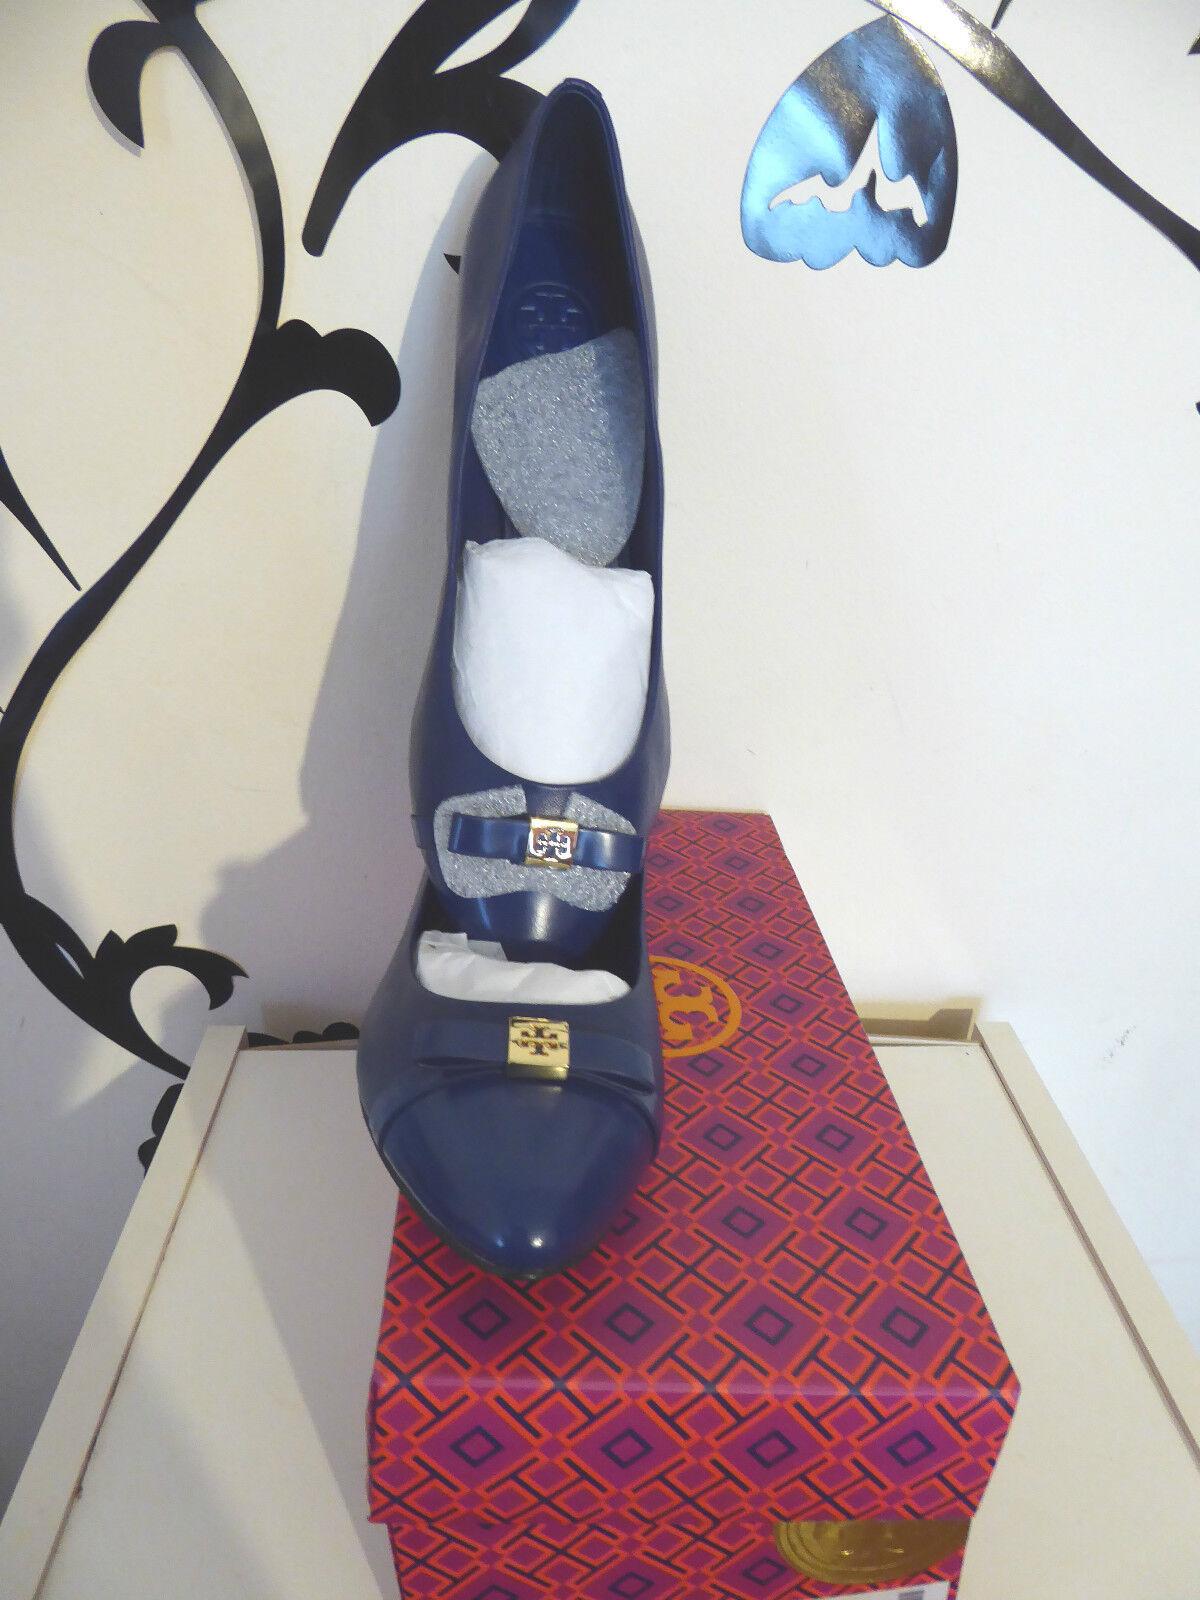 Tory Burch Hugo Uk7.5 Flat Navy Blau ULTRAMARINE/ULTRAMARINE 455 US10.5 Uk7.5 Hugo Eu 40.5 d40634